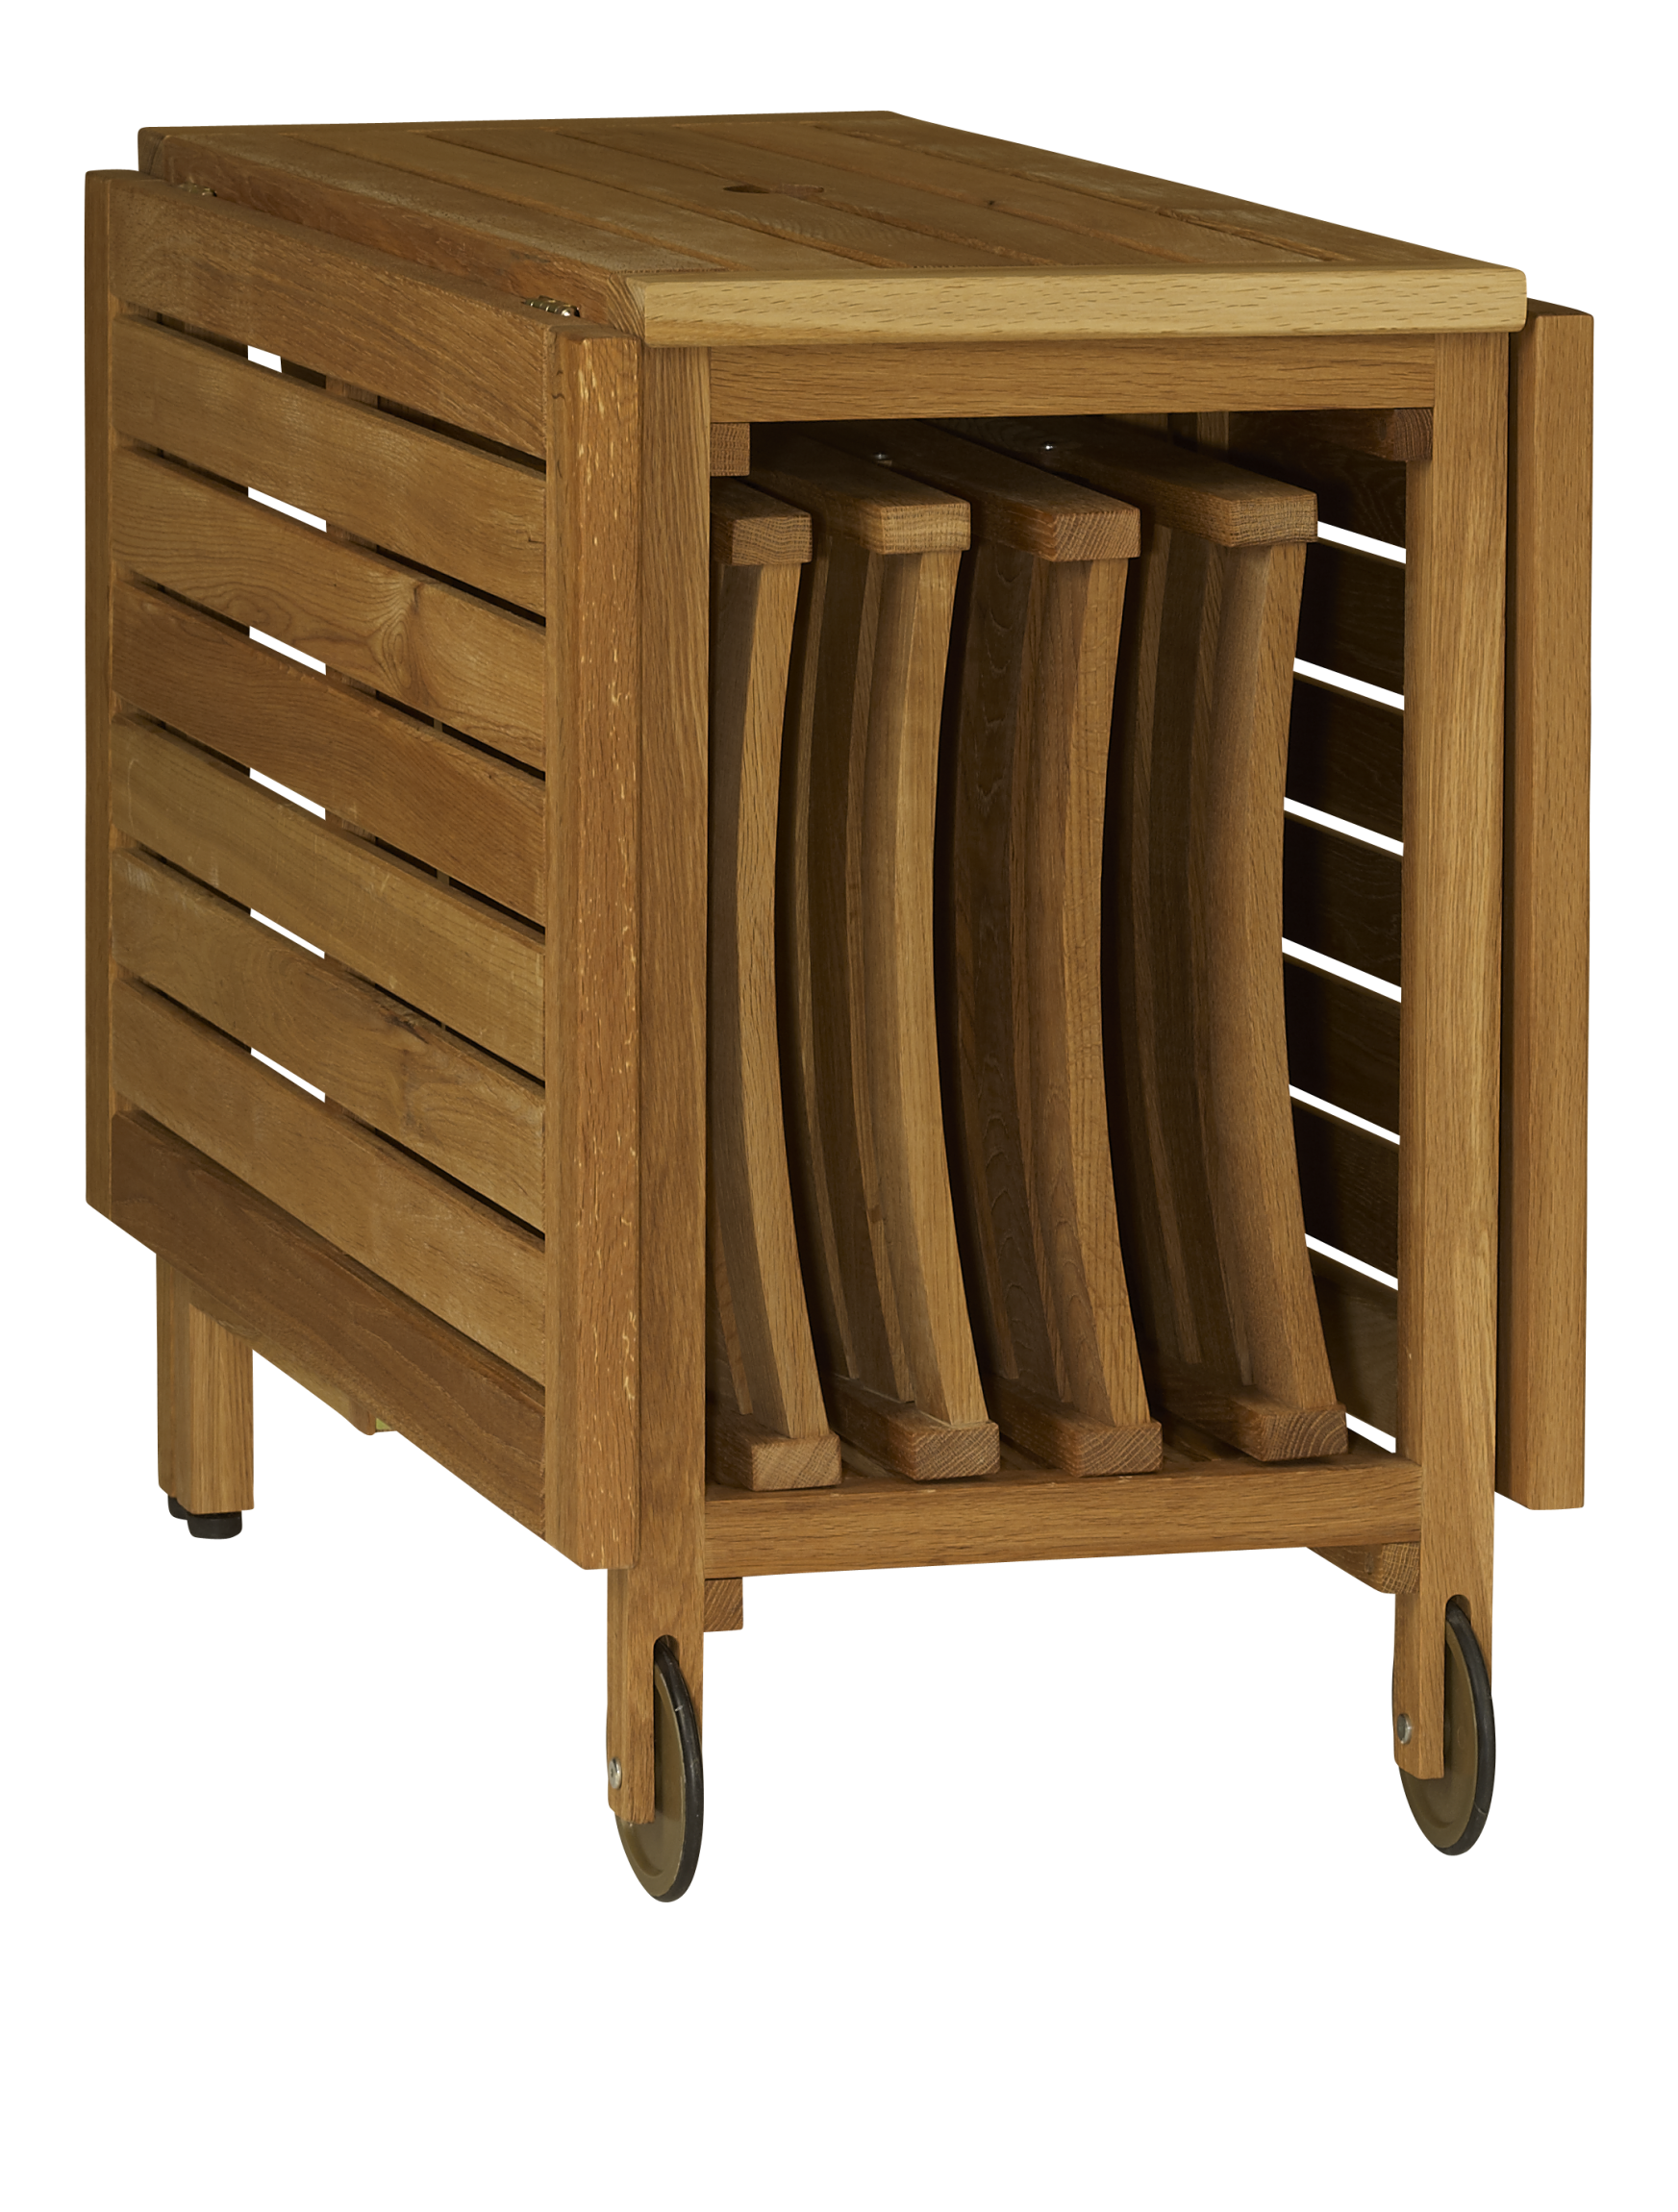 Zeno Table Pliante Et 4 Chaises En Chene Massif Huile 150 X 95 Cm Table Pliante Table Pliante Exterieur Table De Jardin Pliante